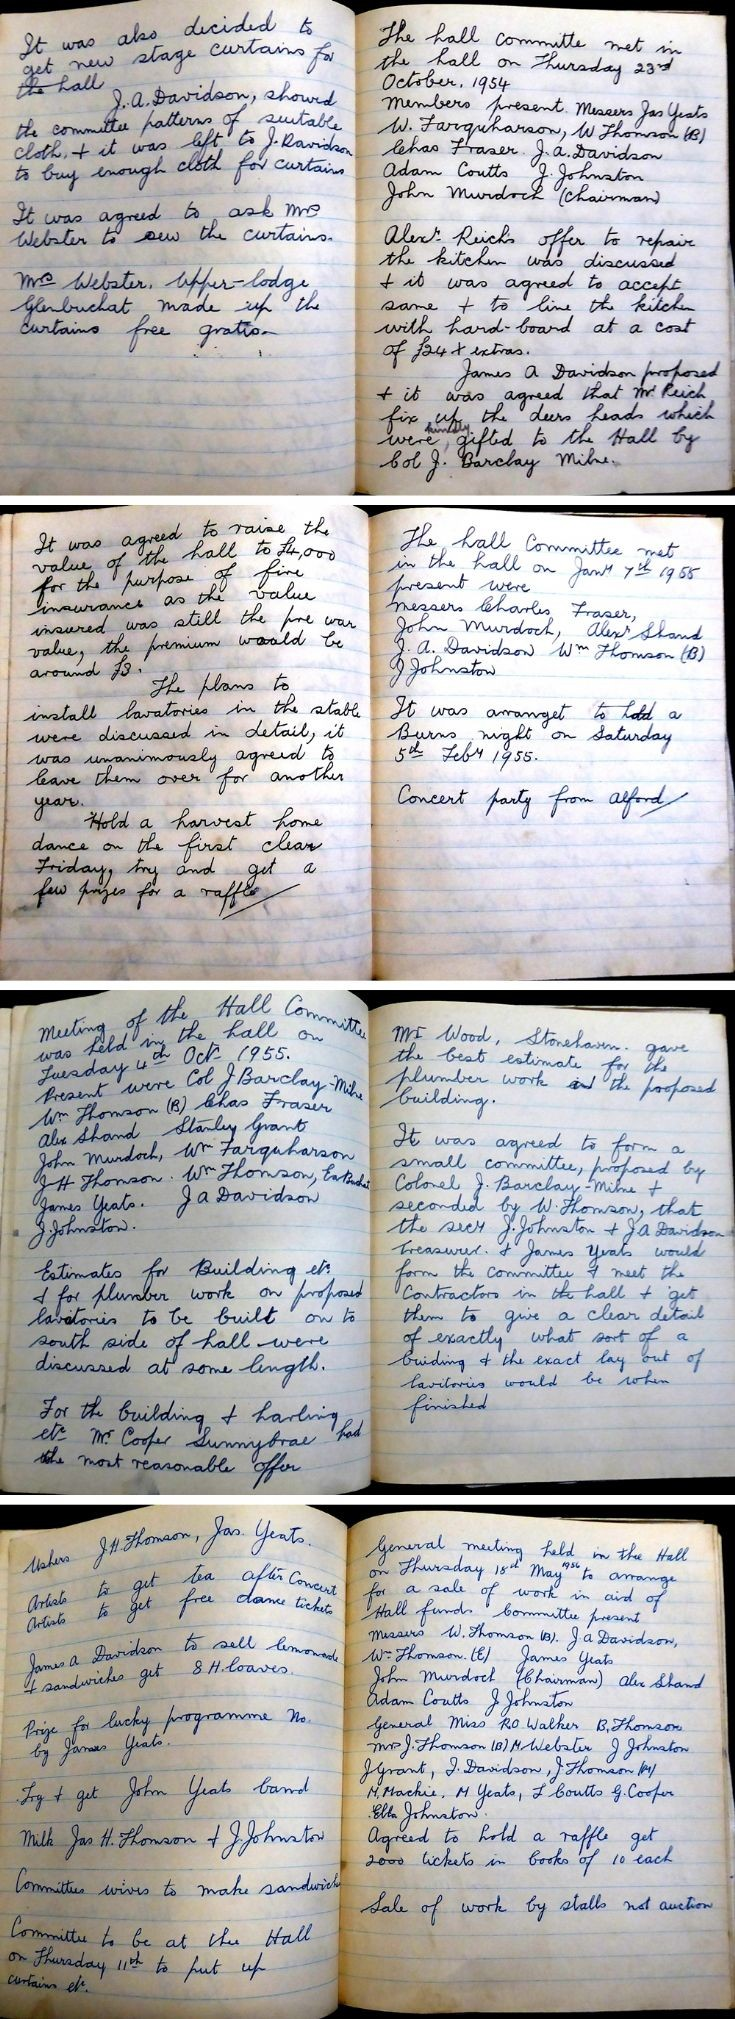 42 Glenbuchat Hall Committee Minutes